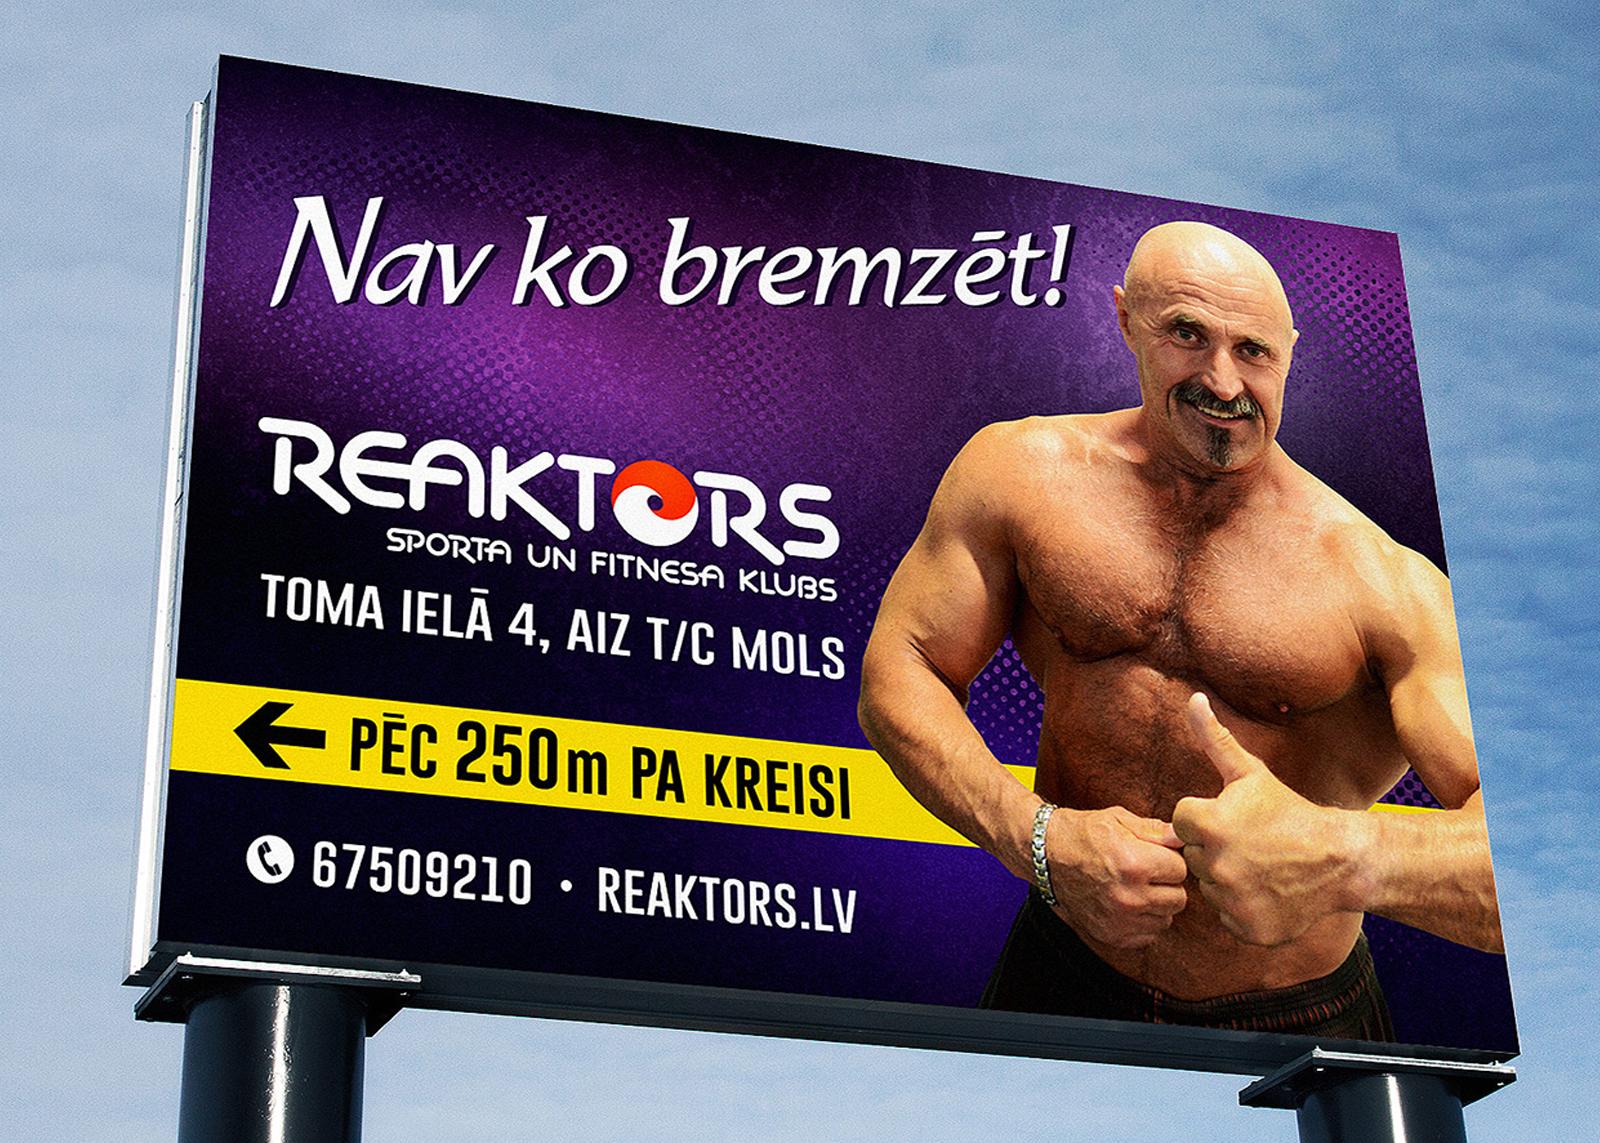 reaktors 2.2